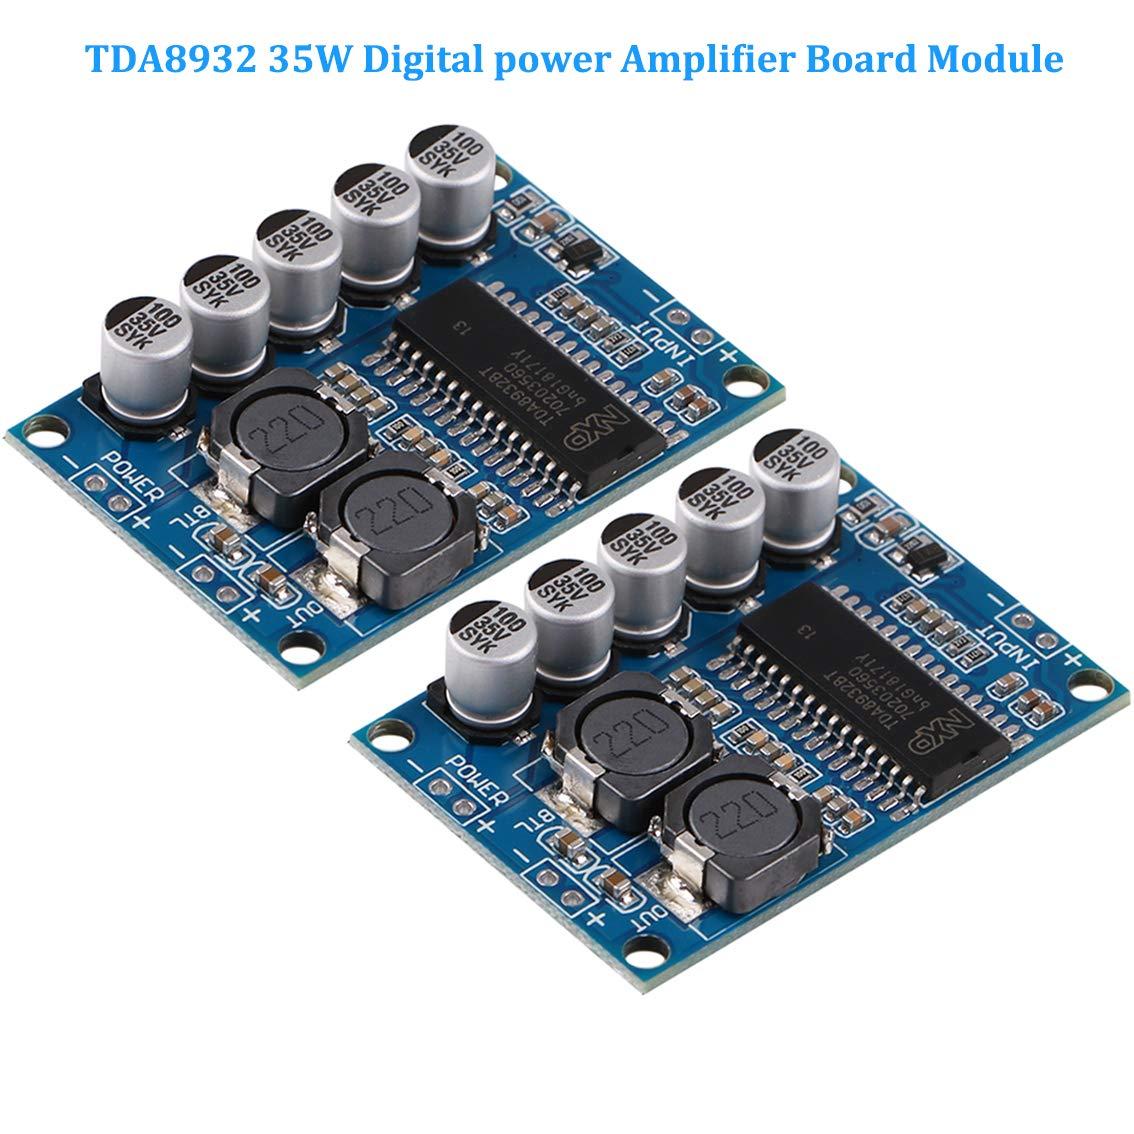 Innovateking-EU 2 St/ück Digitales Verst/ärkerplatine Modul 5Wx2 Lautst/ärkepotentiometer Stereo Ger/äuschloses Leistungsverst/ärker Modul PAM8406